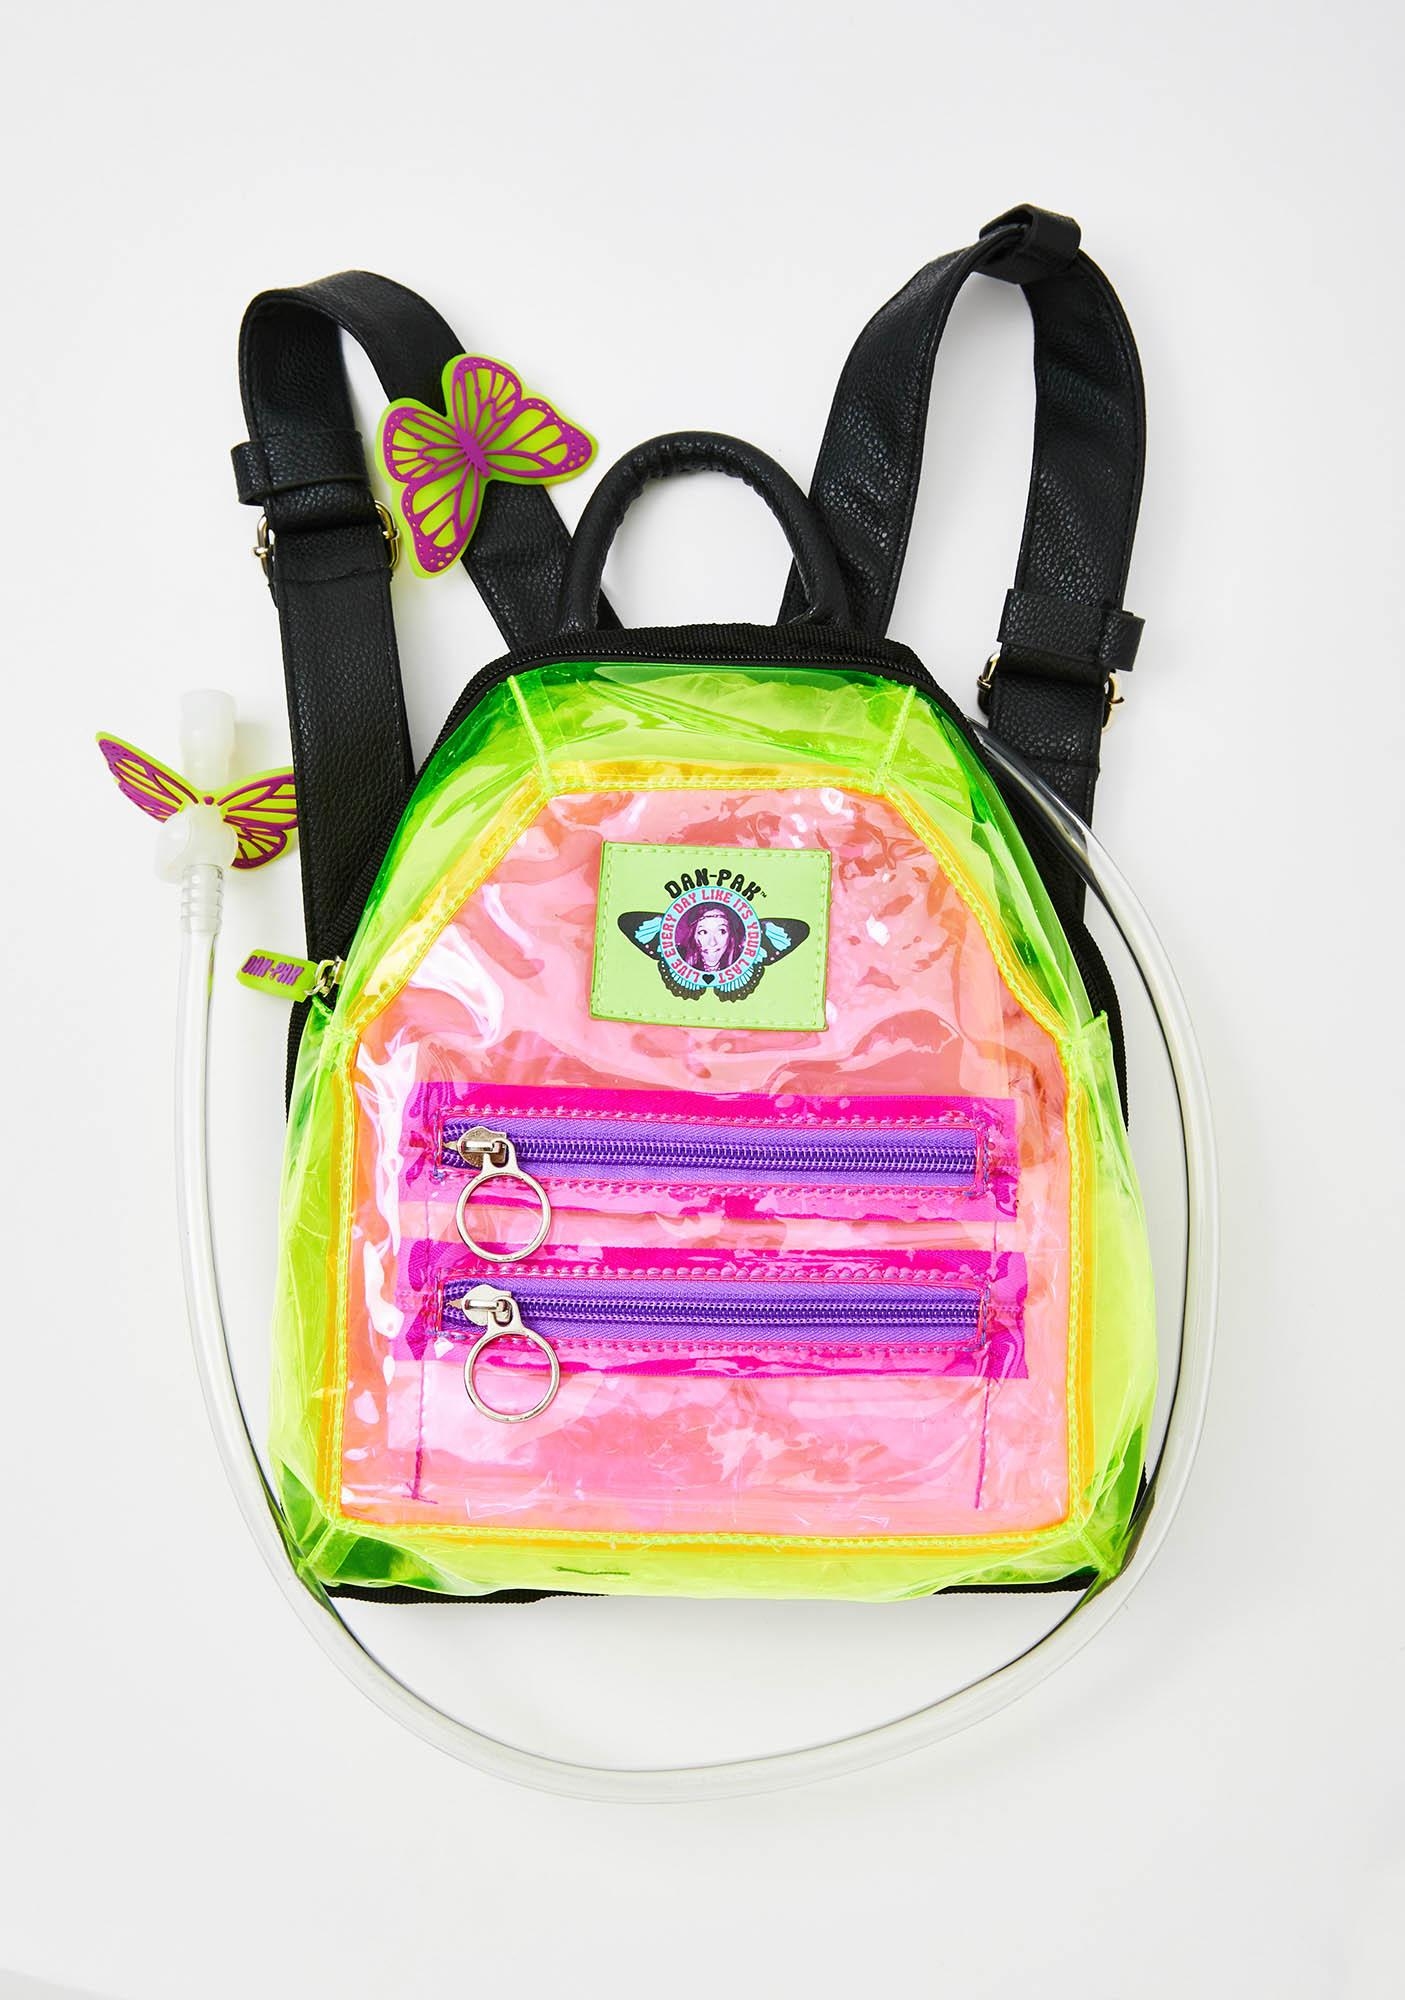 Dan-Pak Clearly Furry Mini Hydration Backpack